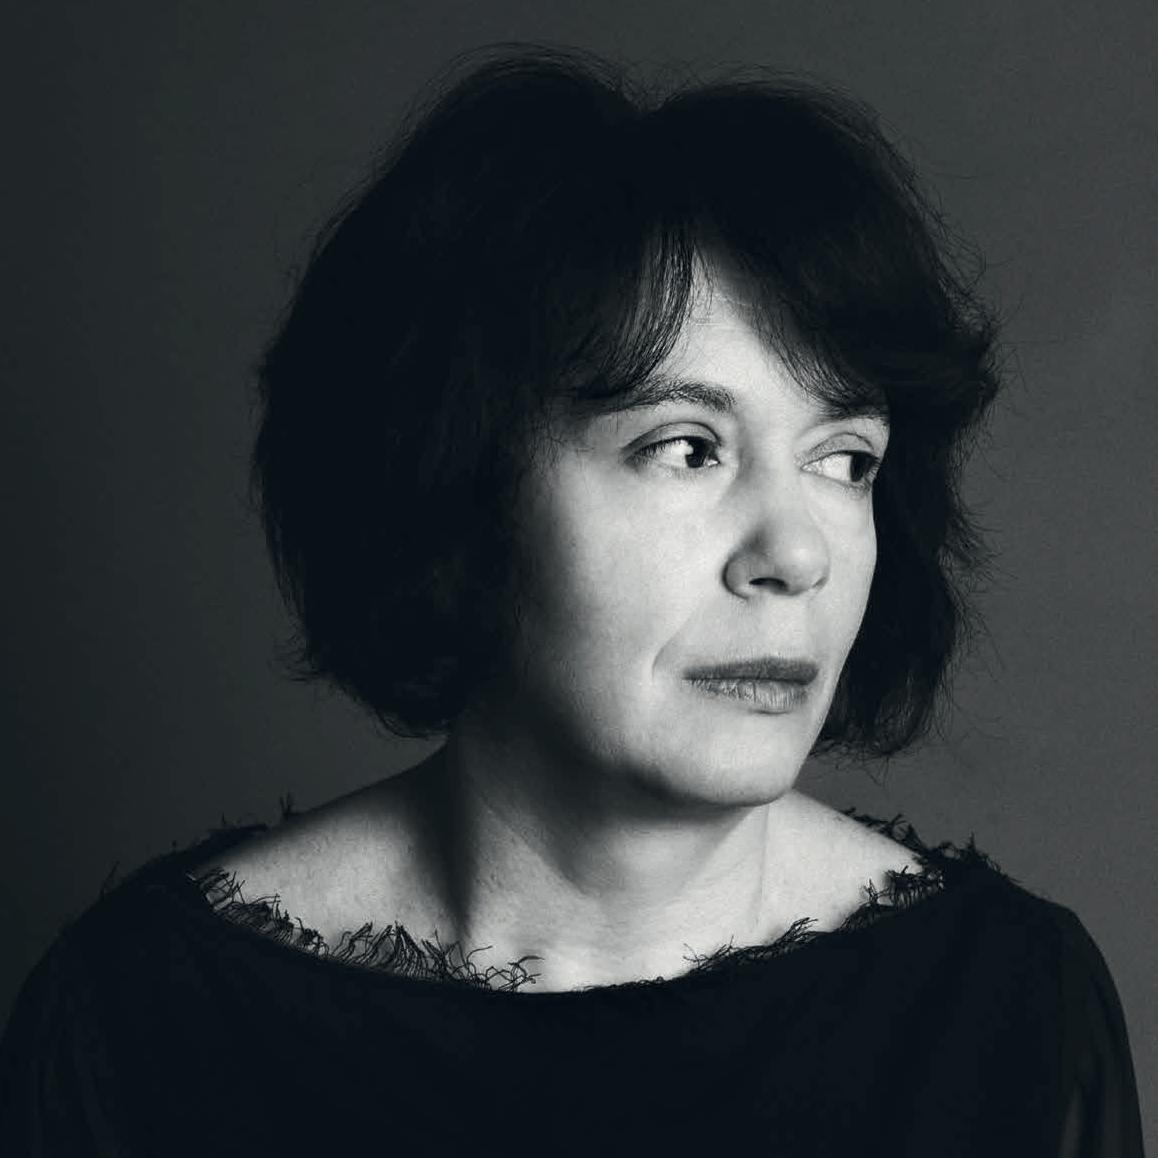 Katia Tchemberdji